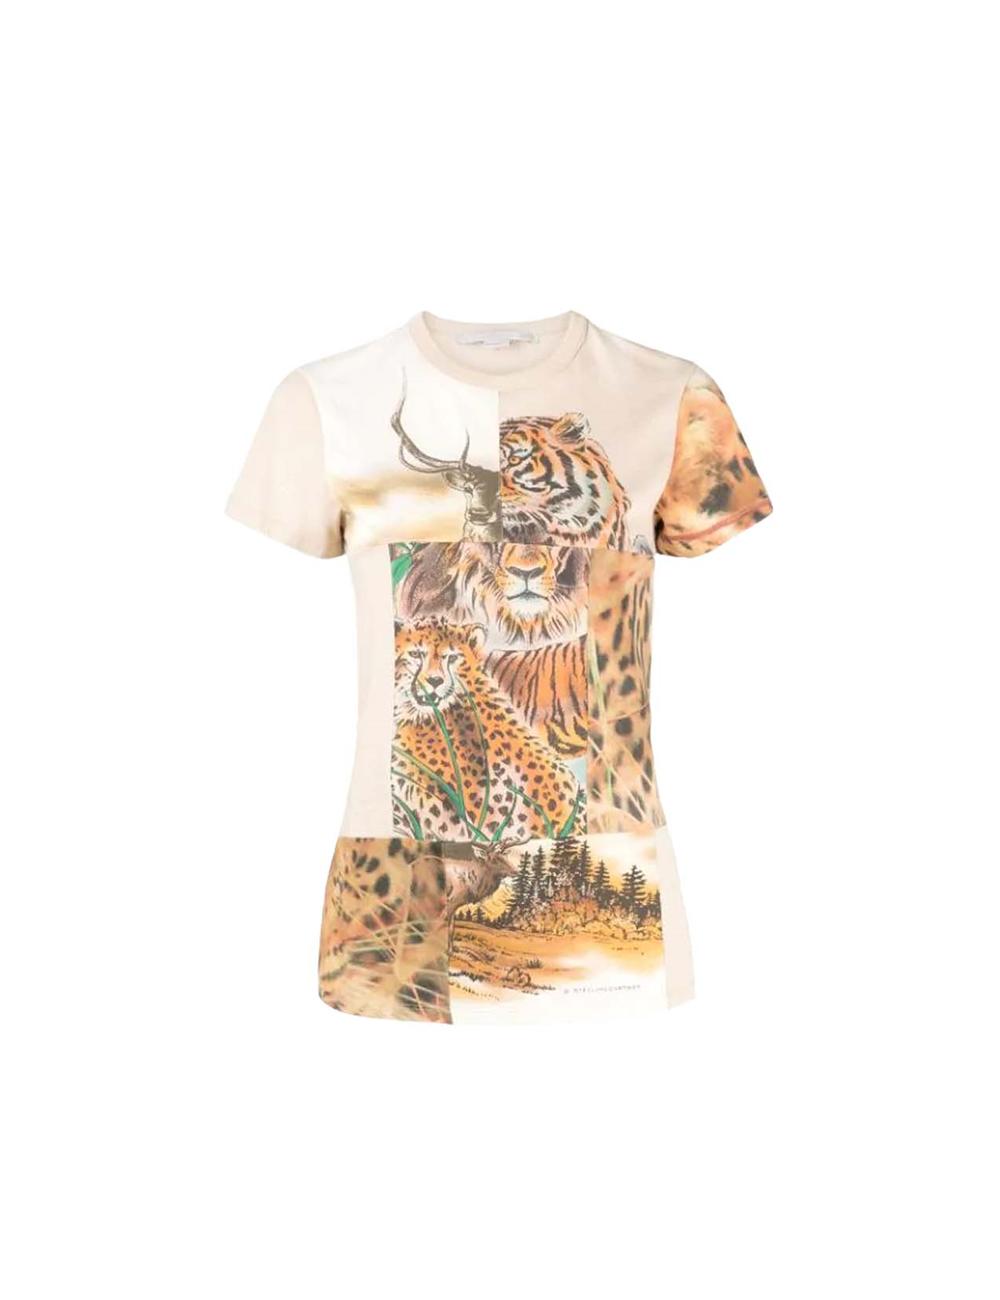 T-shirt savannah patchwork Stella McCartney - BIG BOSS MEGEVE